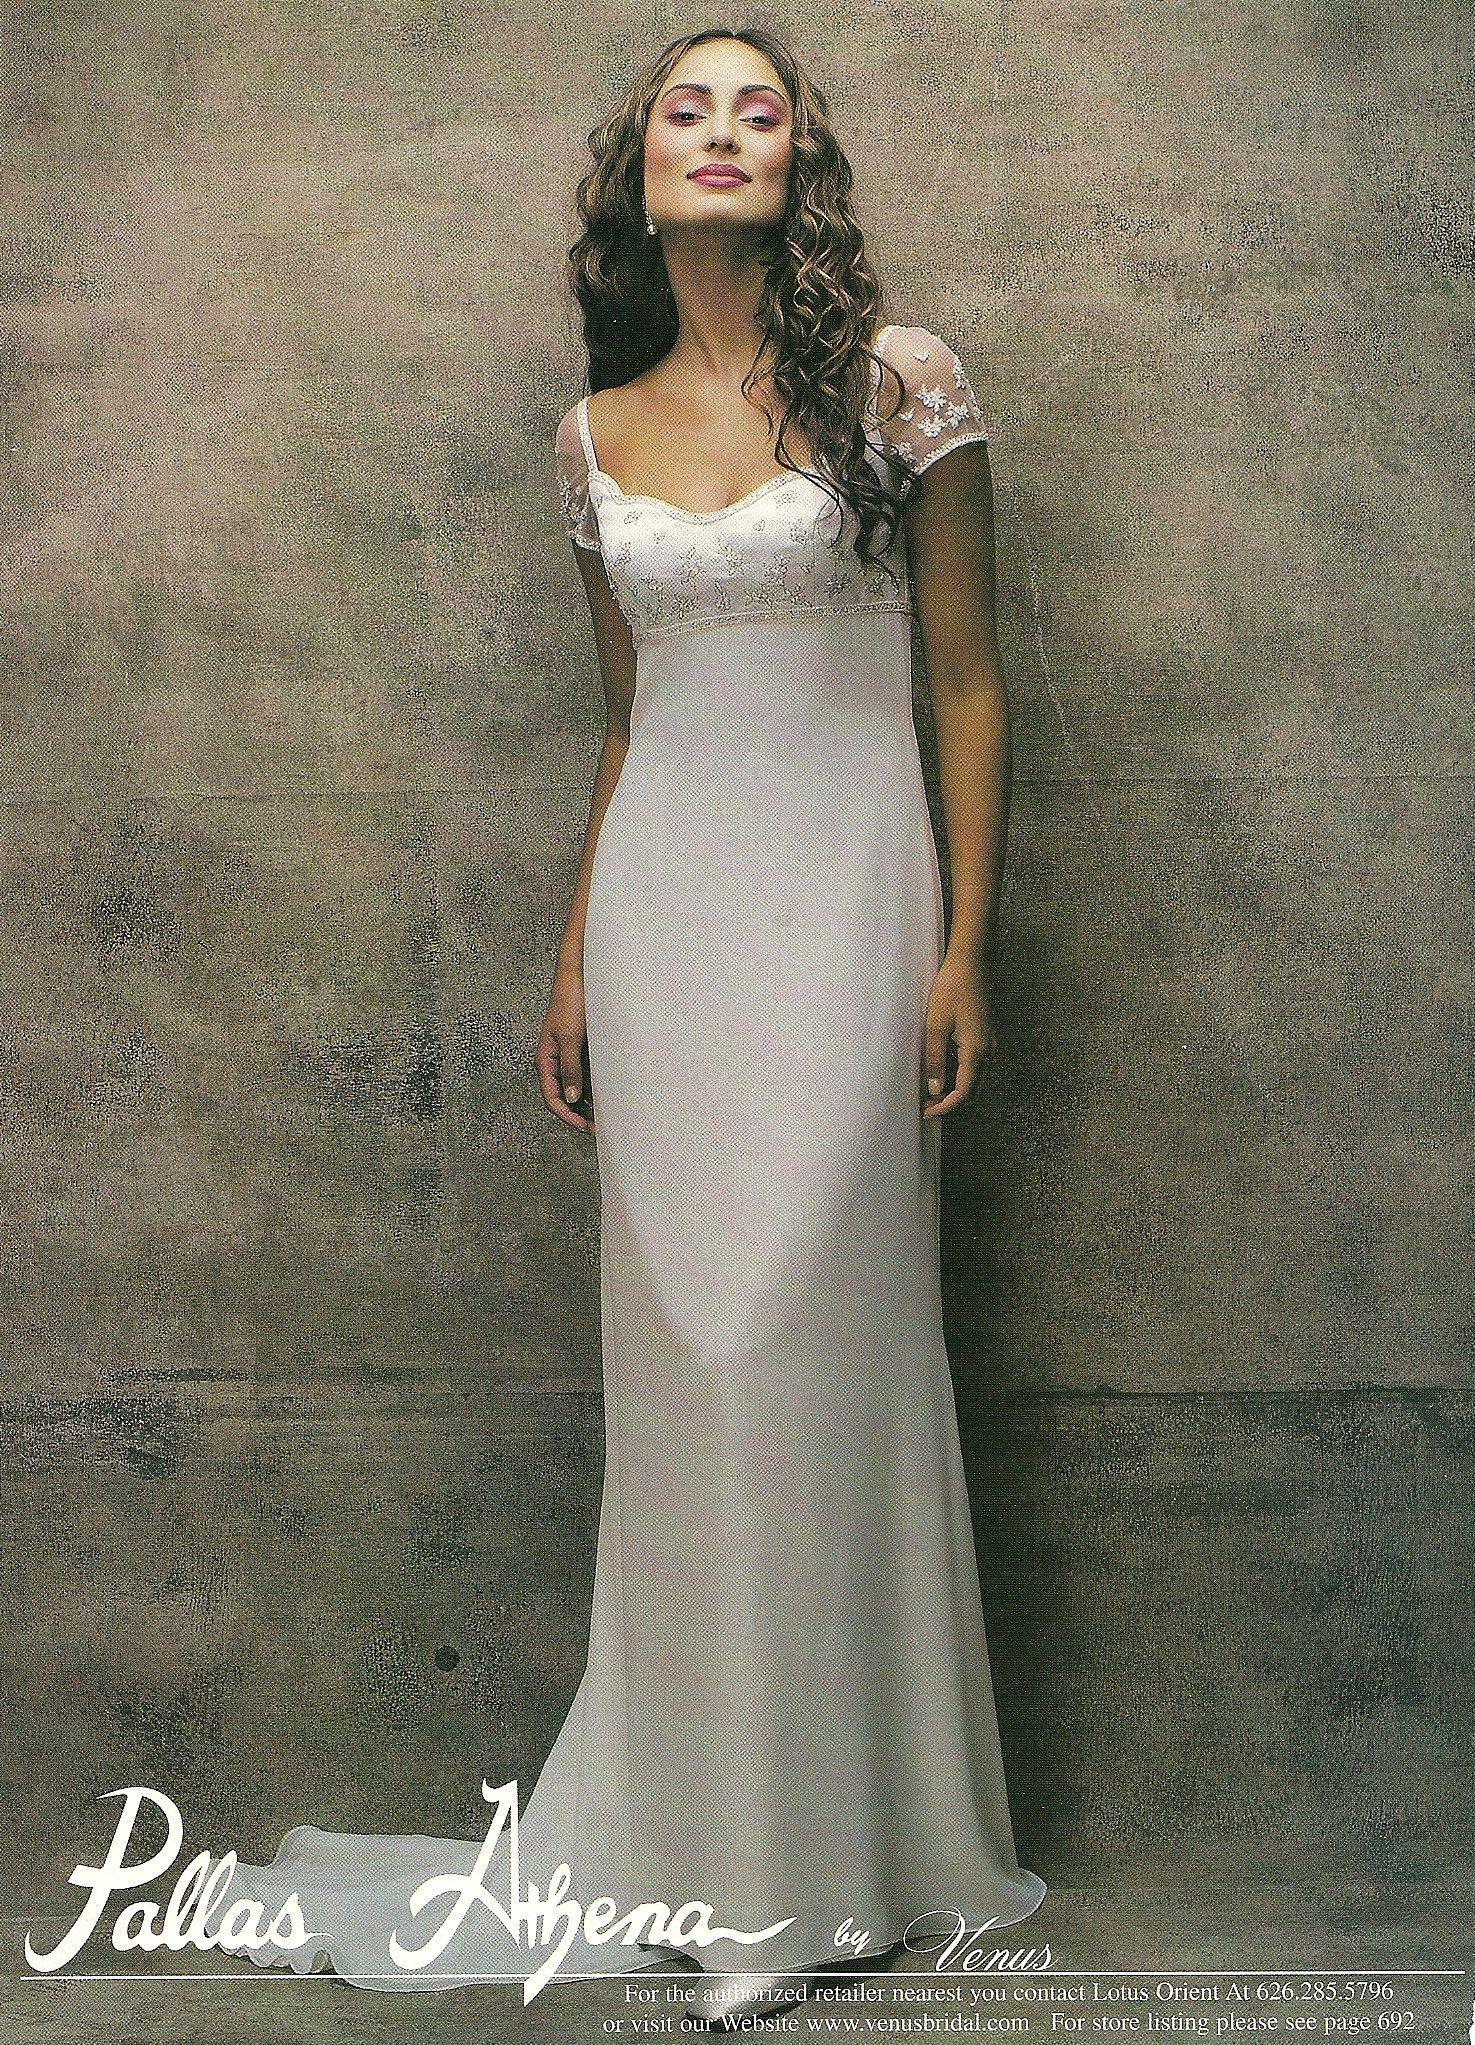 Pallas athena 9793 272 size 2 wedding dress wedding dress and pallas athena 9793 272 second hand wedding dress on sale 65 off ombrellifo Choice Image